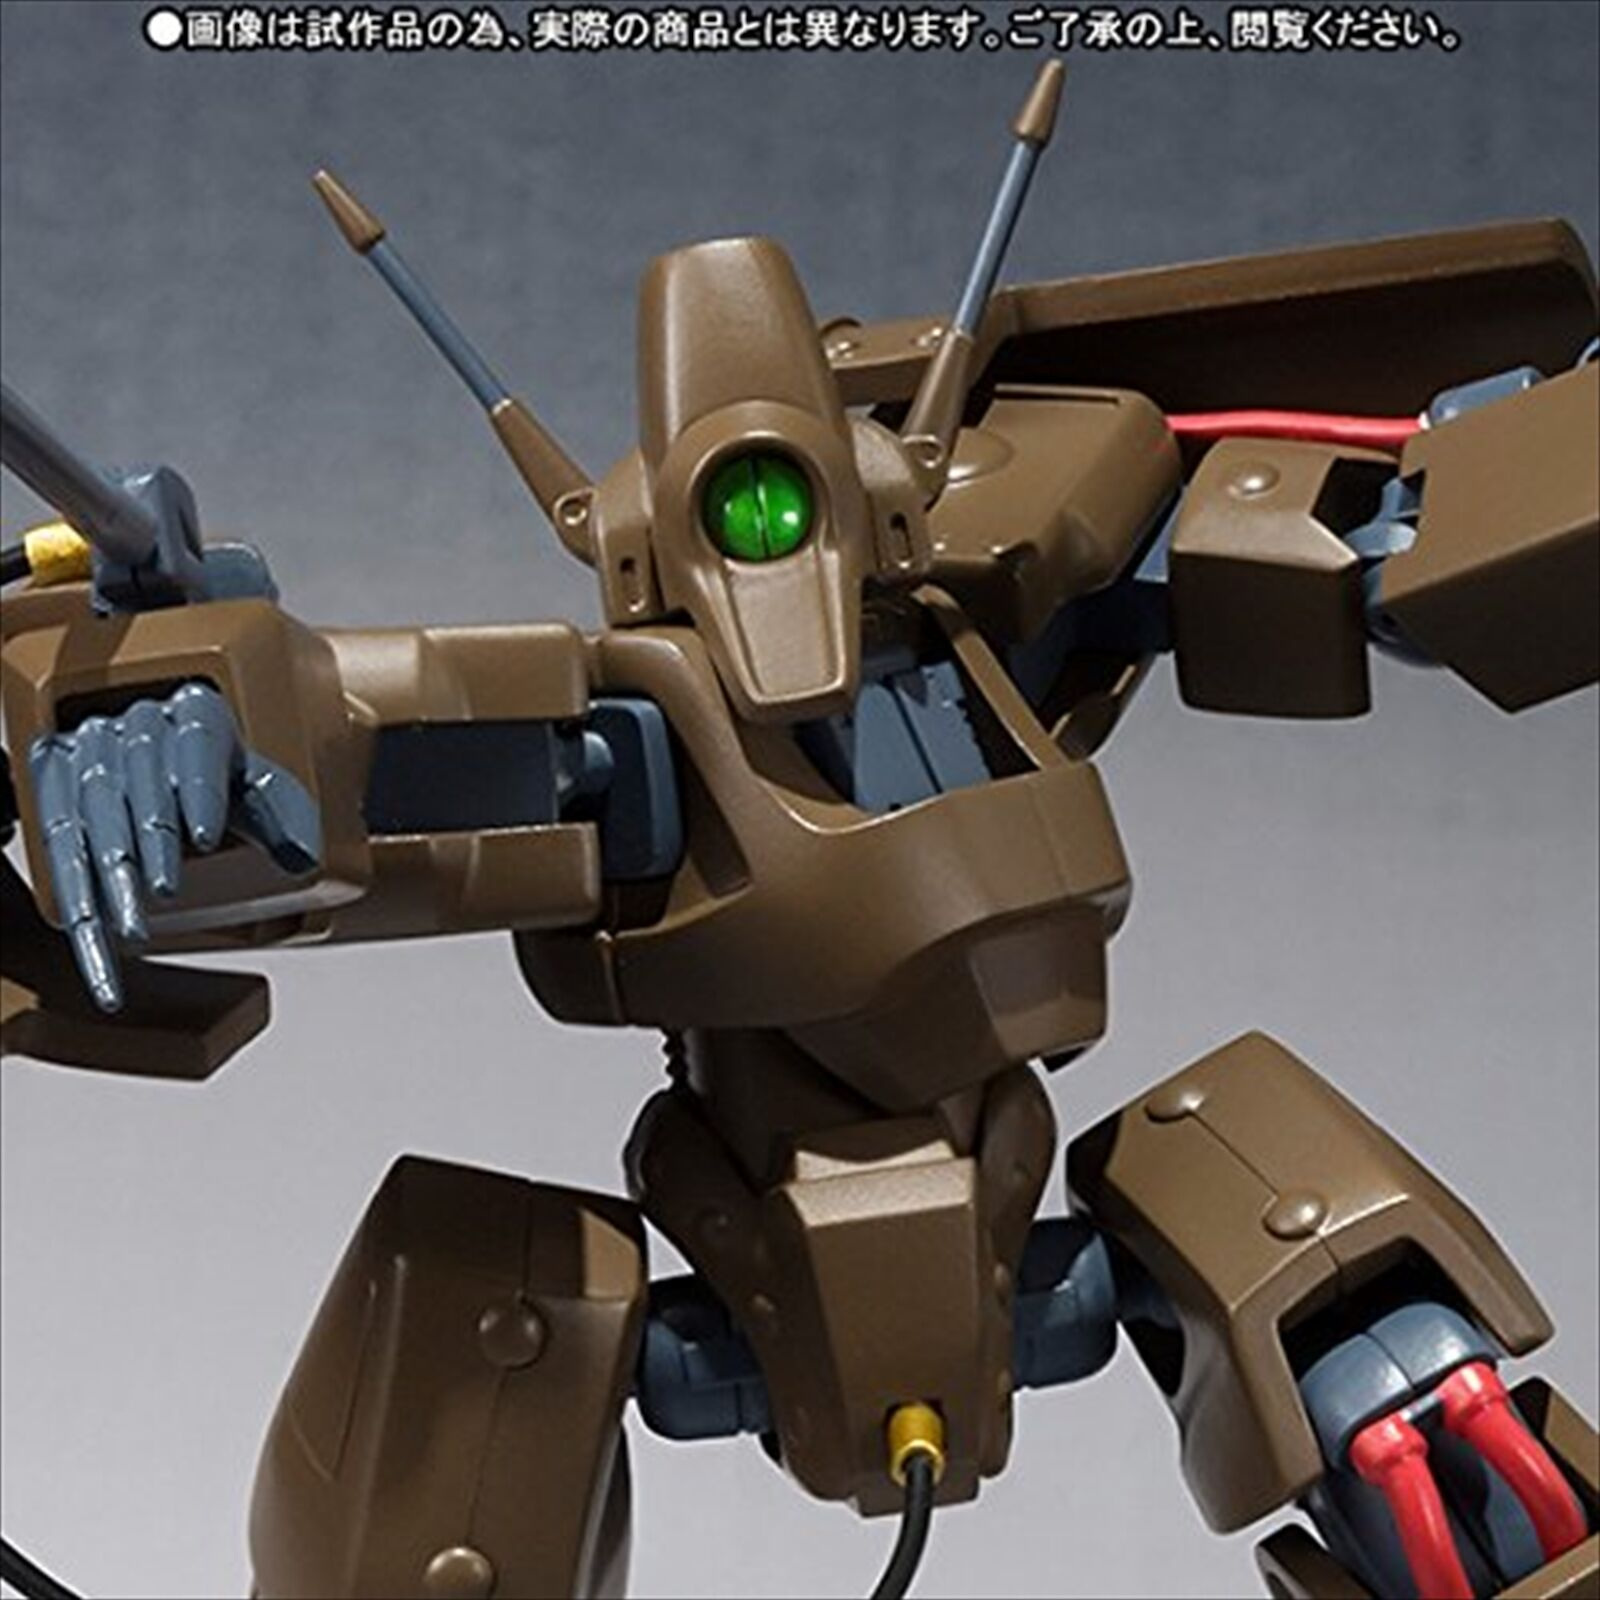 Bandai ROBOT SPIRITS SIDE HM Heavy Metal L-Gaim GREIA Action Figure